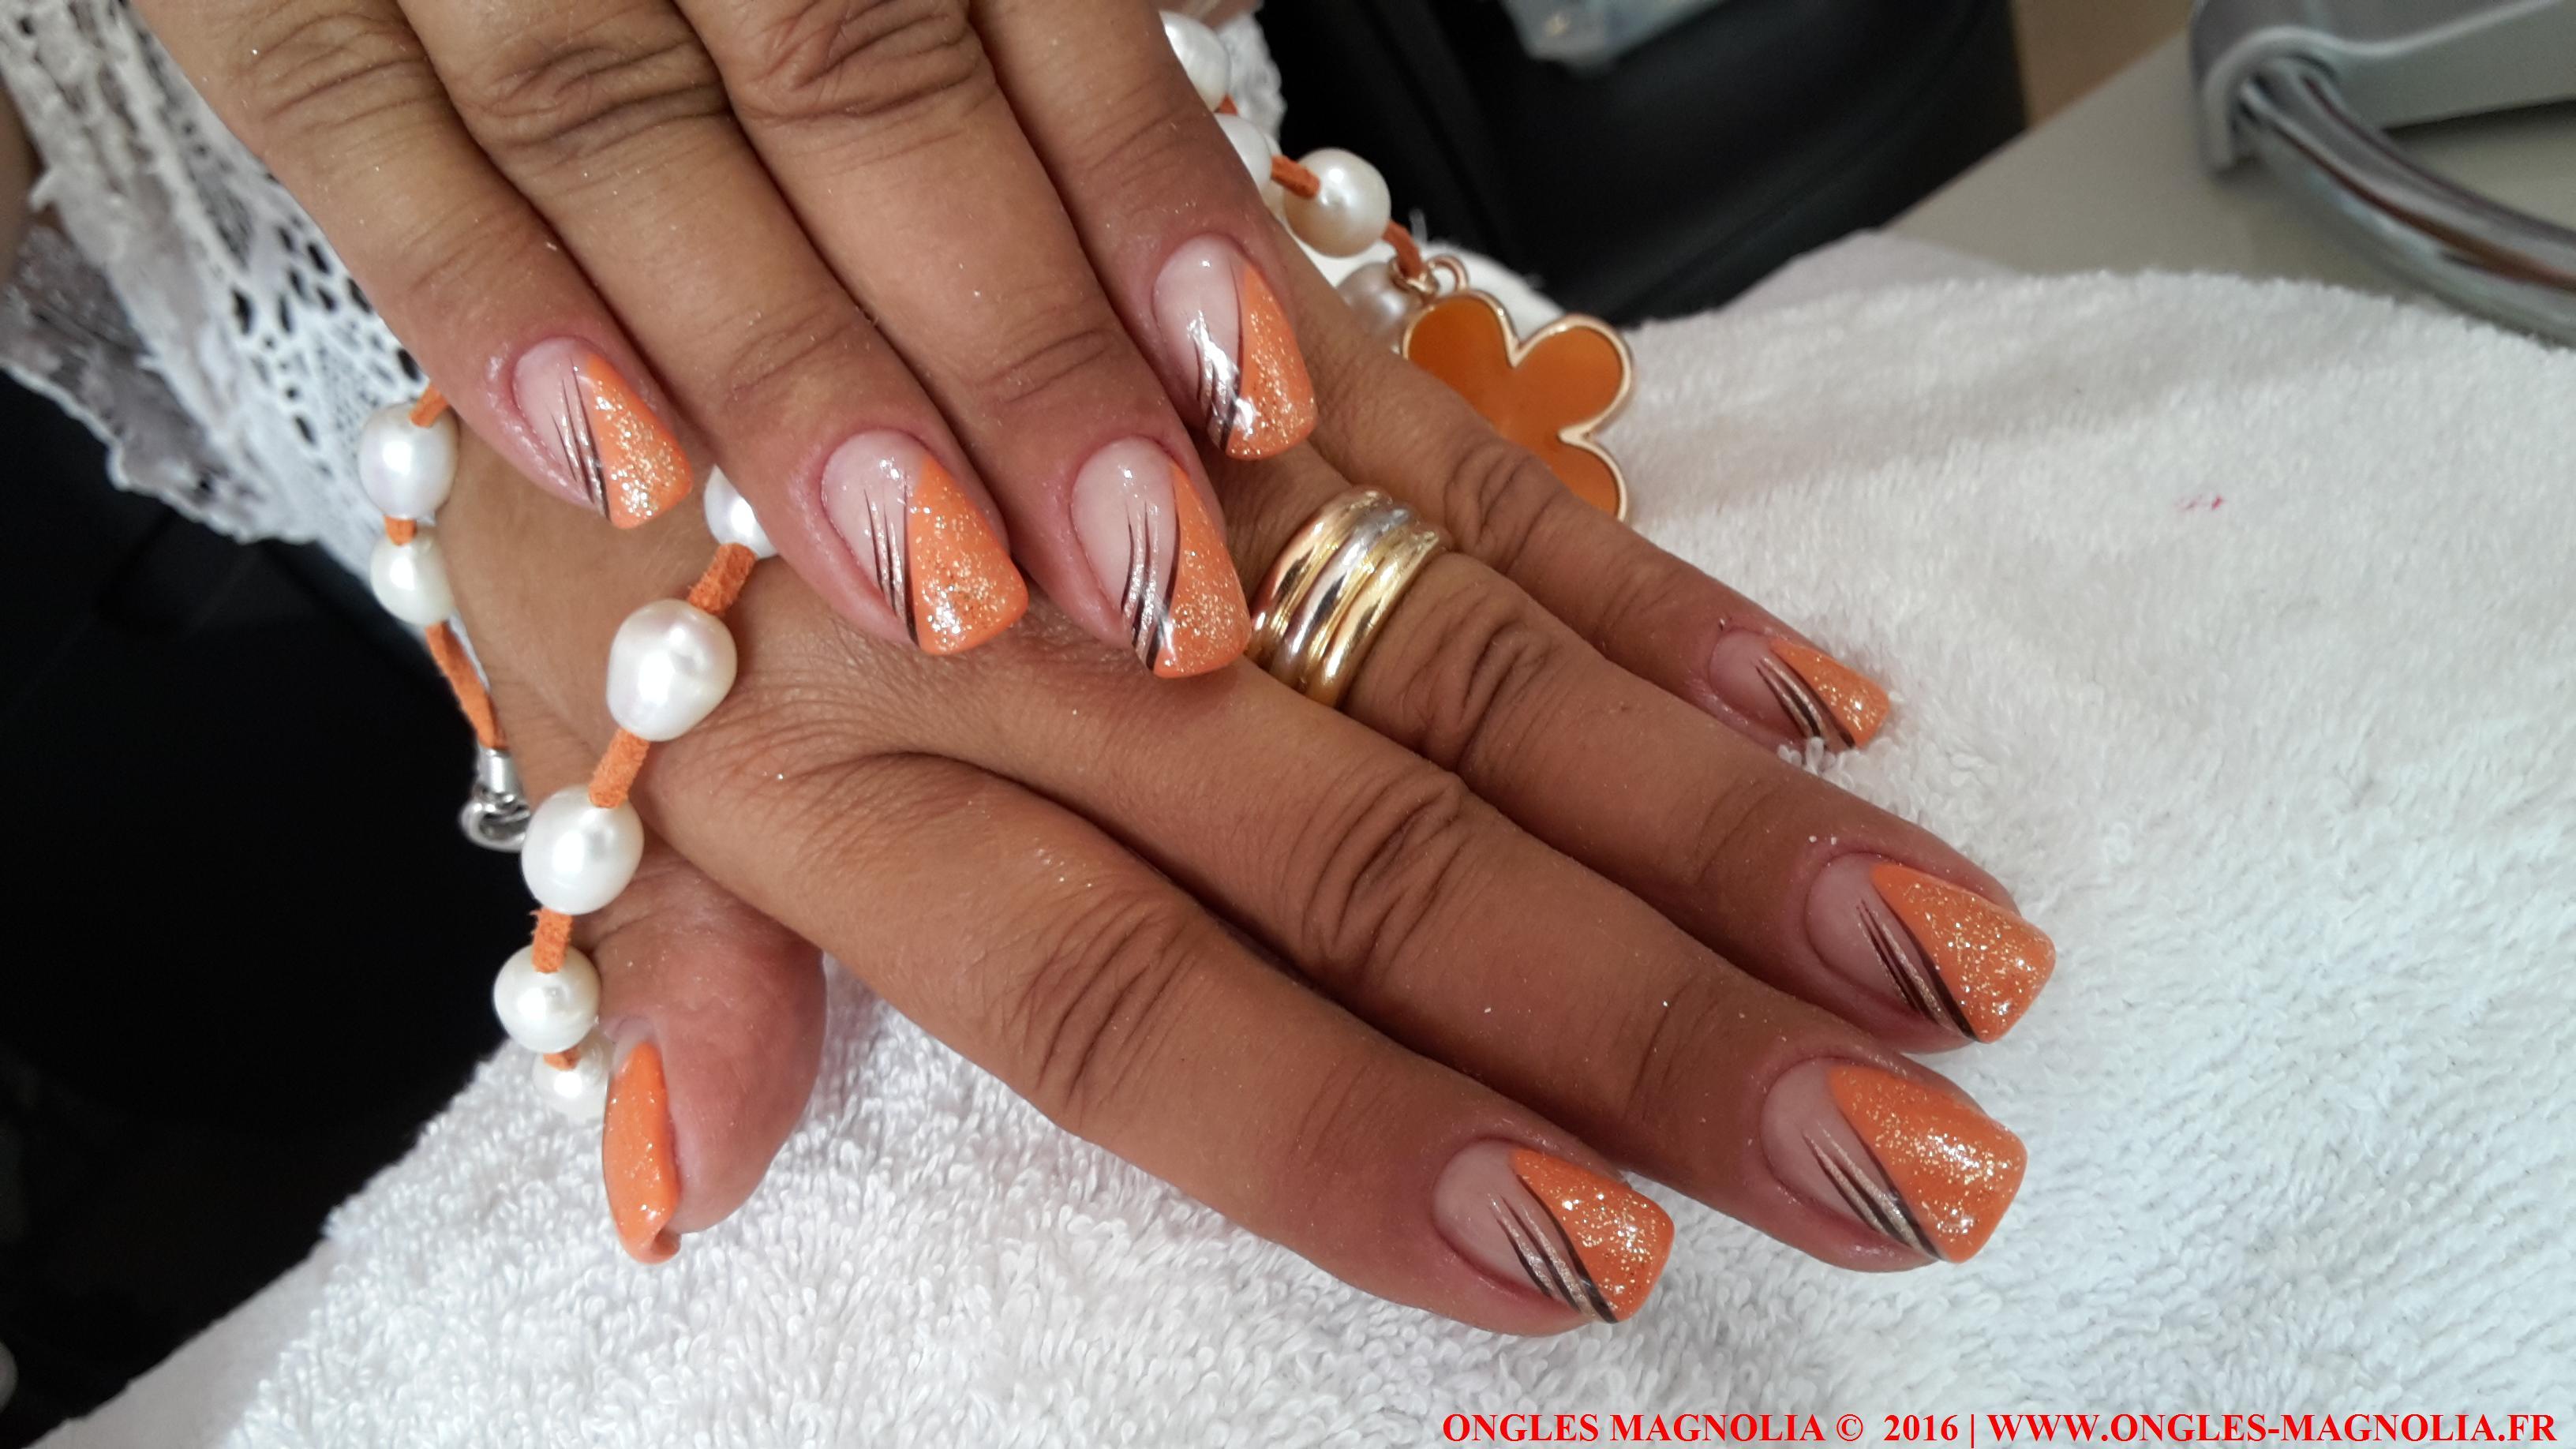 Pose-ongles-nail-art-neuville-sur-saone-lyon-ongles magnolia 062016